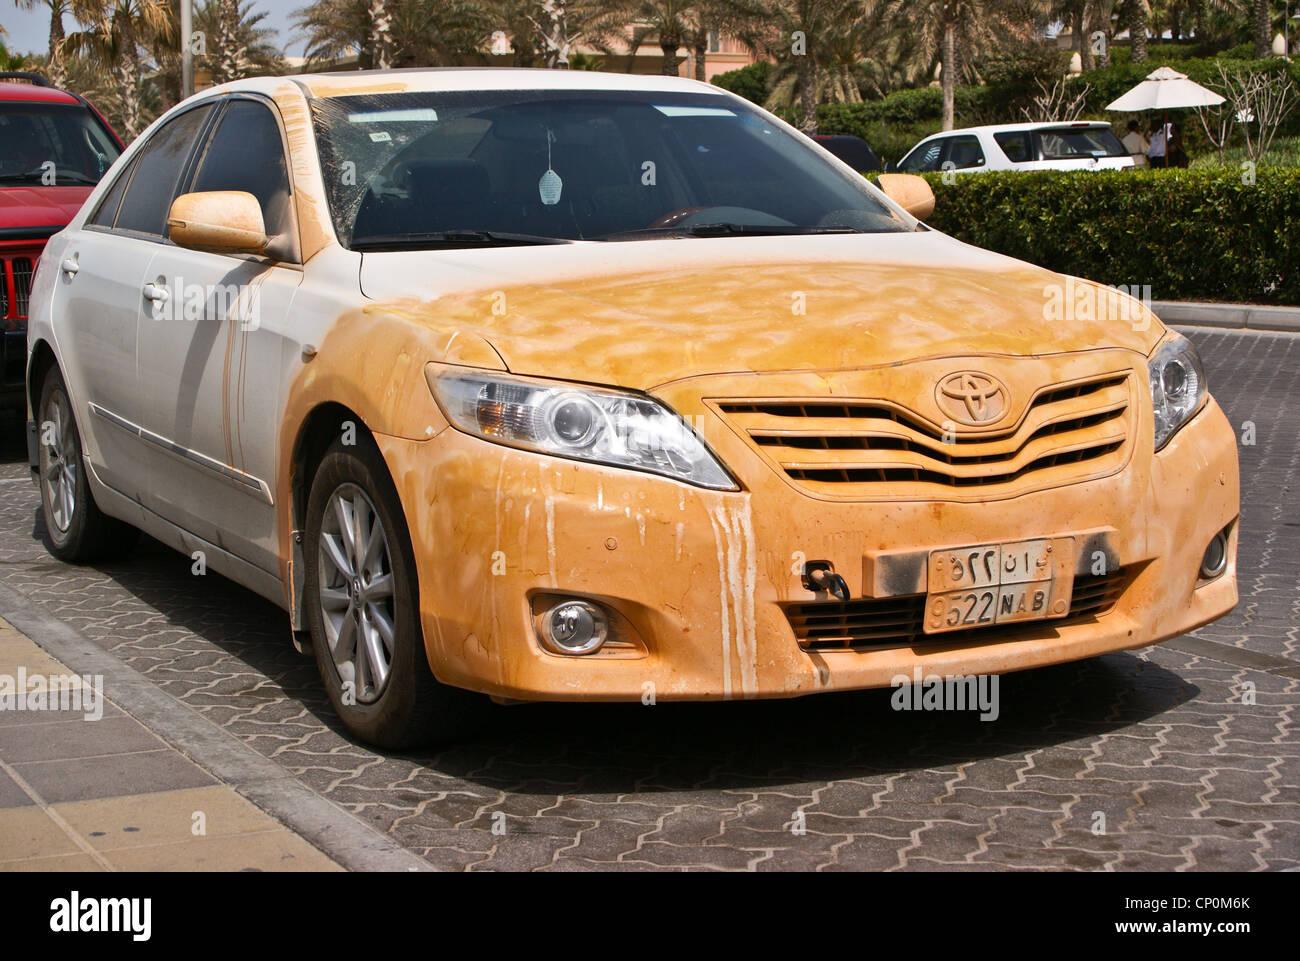 A white toyota camry with orange paint pattern dubai united arab emirates stock